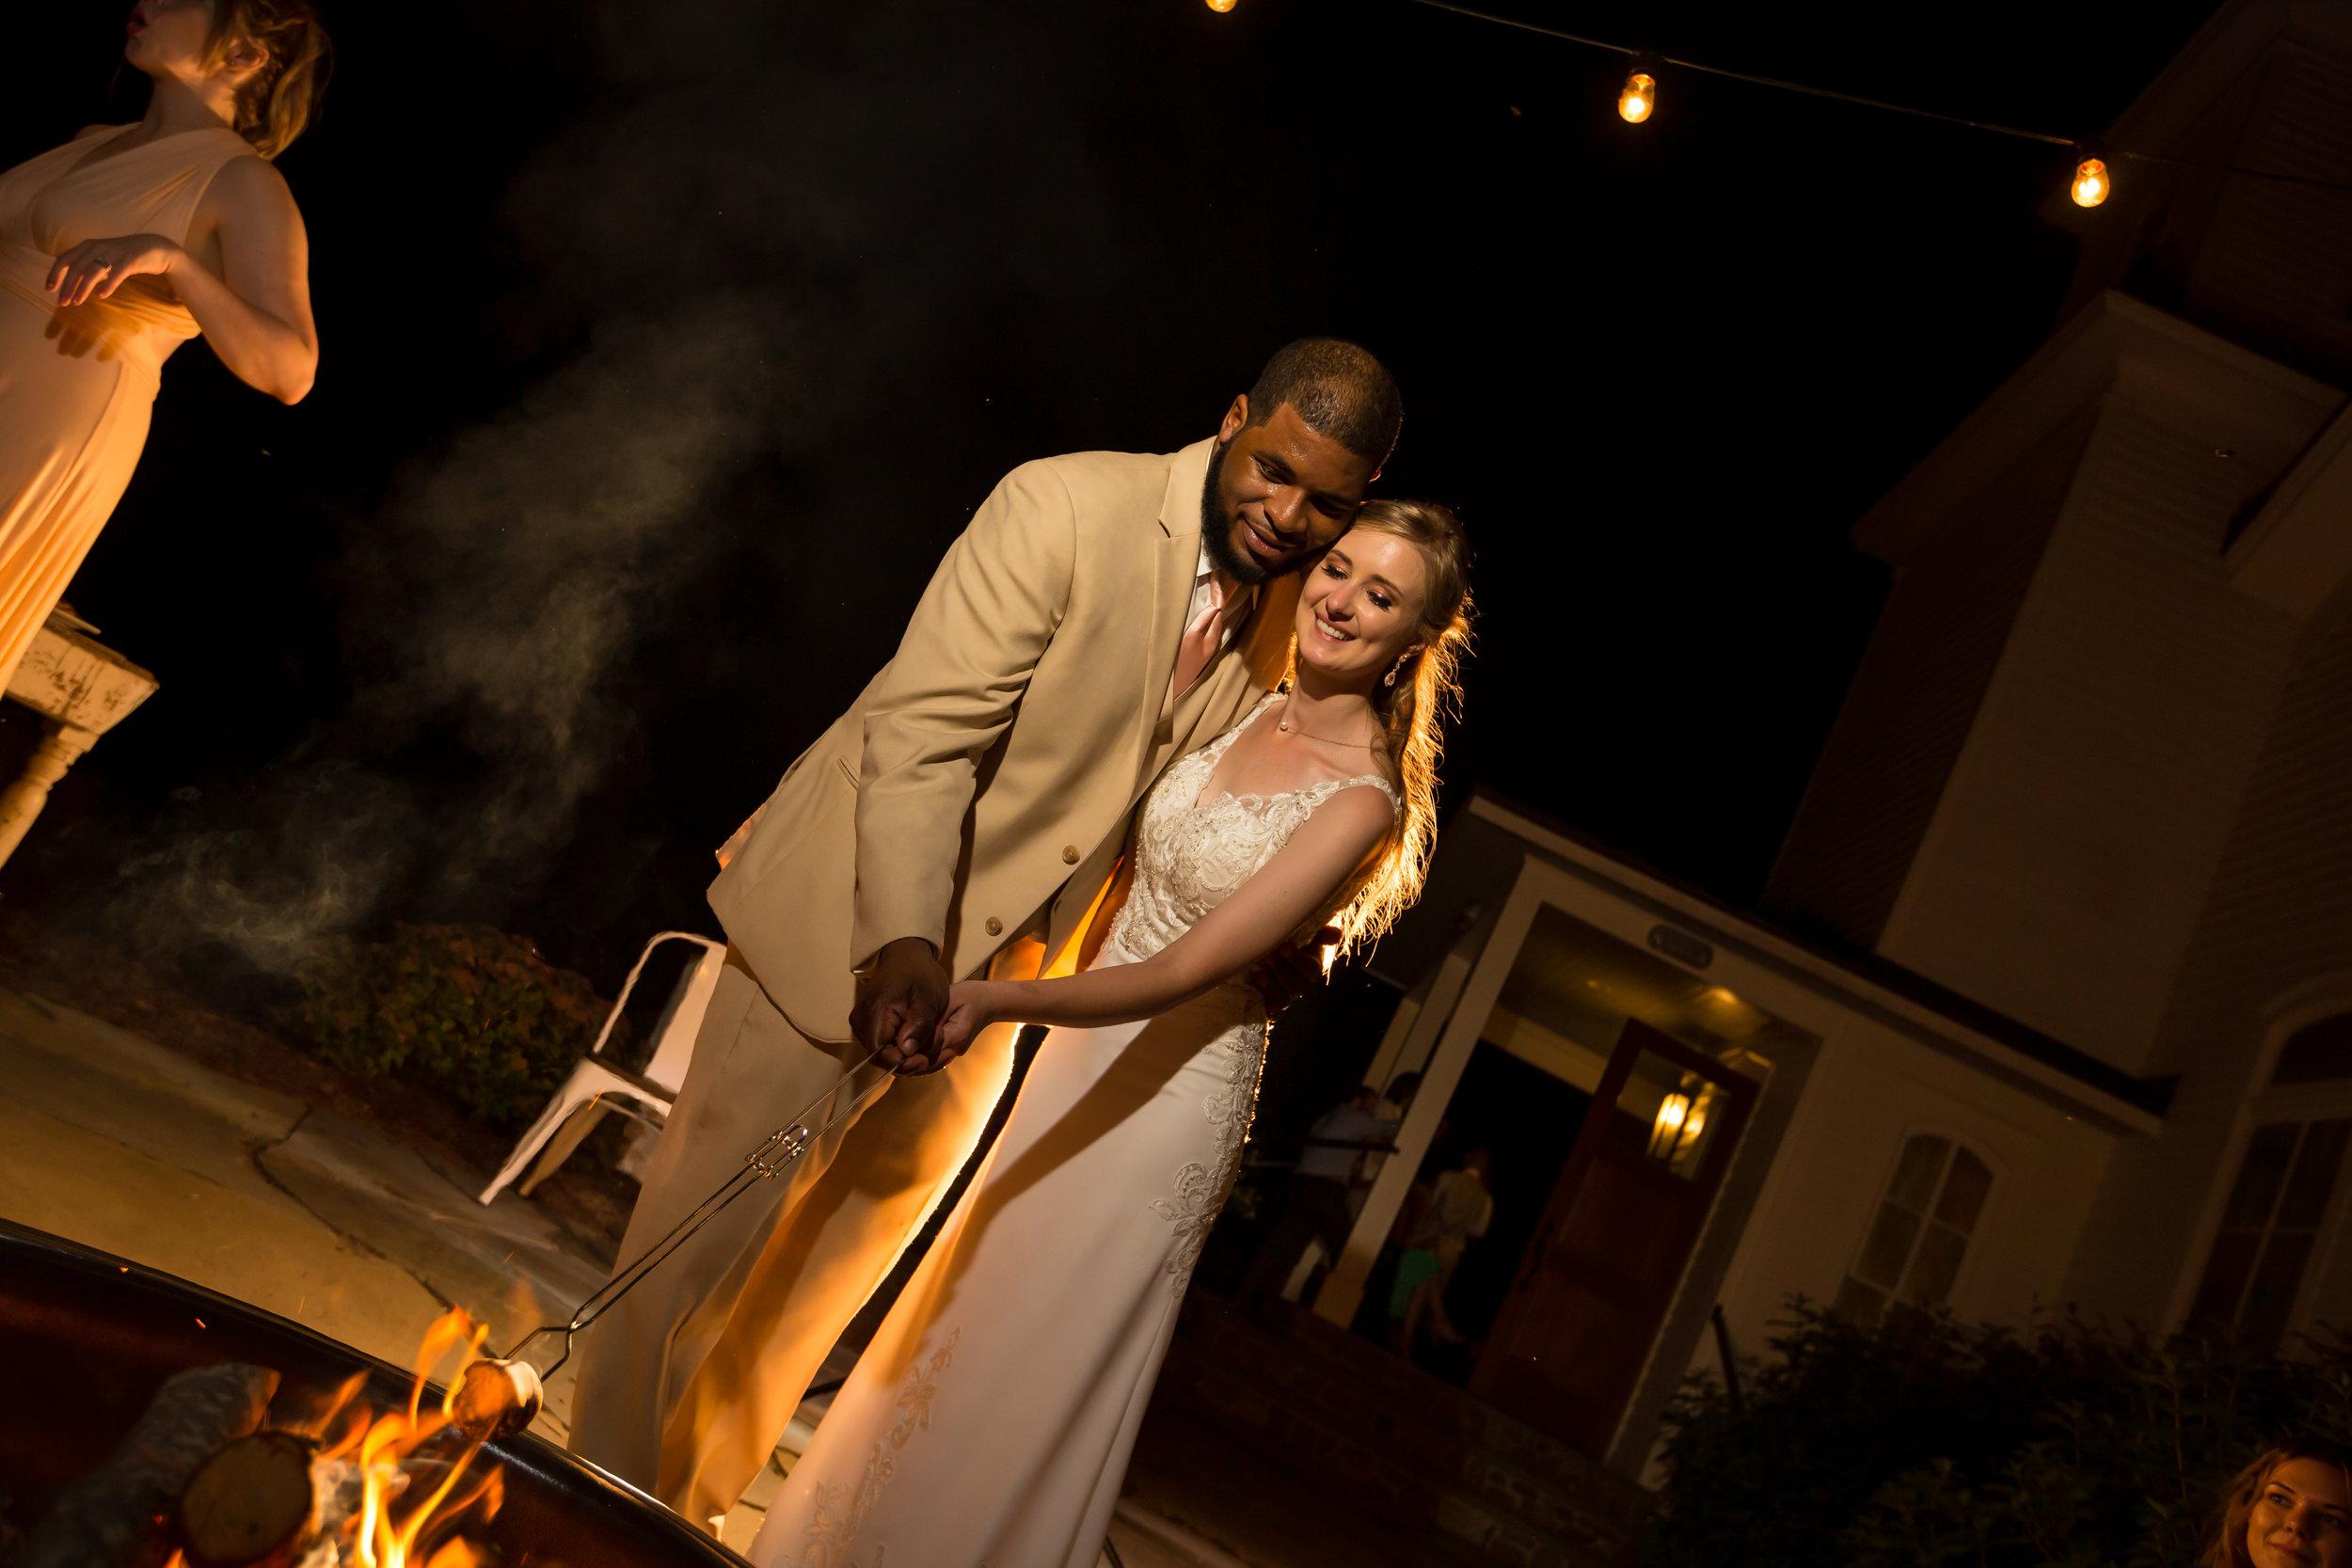 sarah_ikeem_wedding_at_the_parlour_at_manns_chapel_05.18.19-2091.jpg